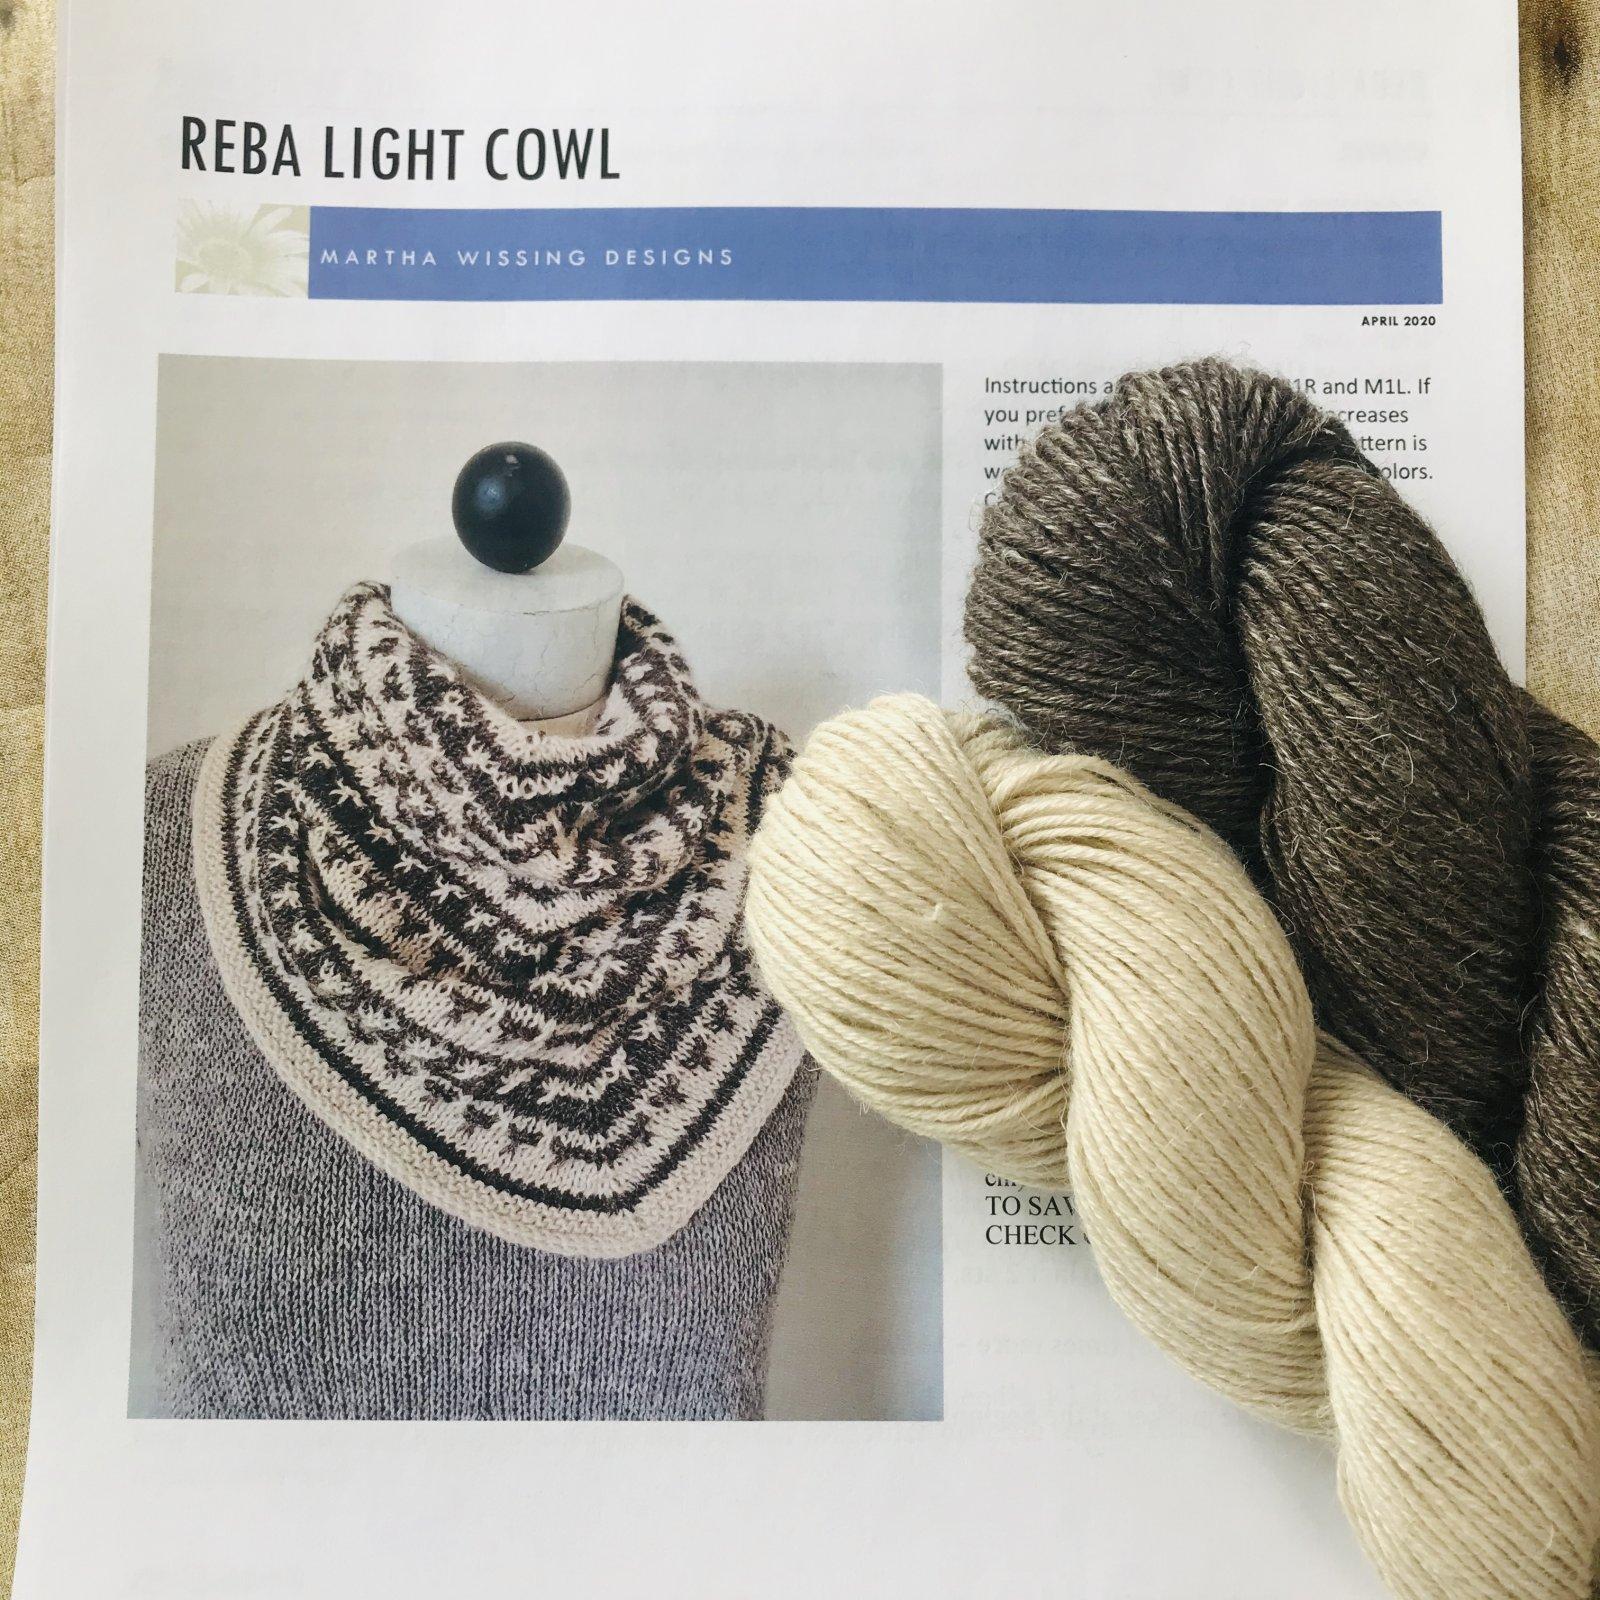 Reba Light Cowl Kit